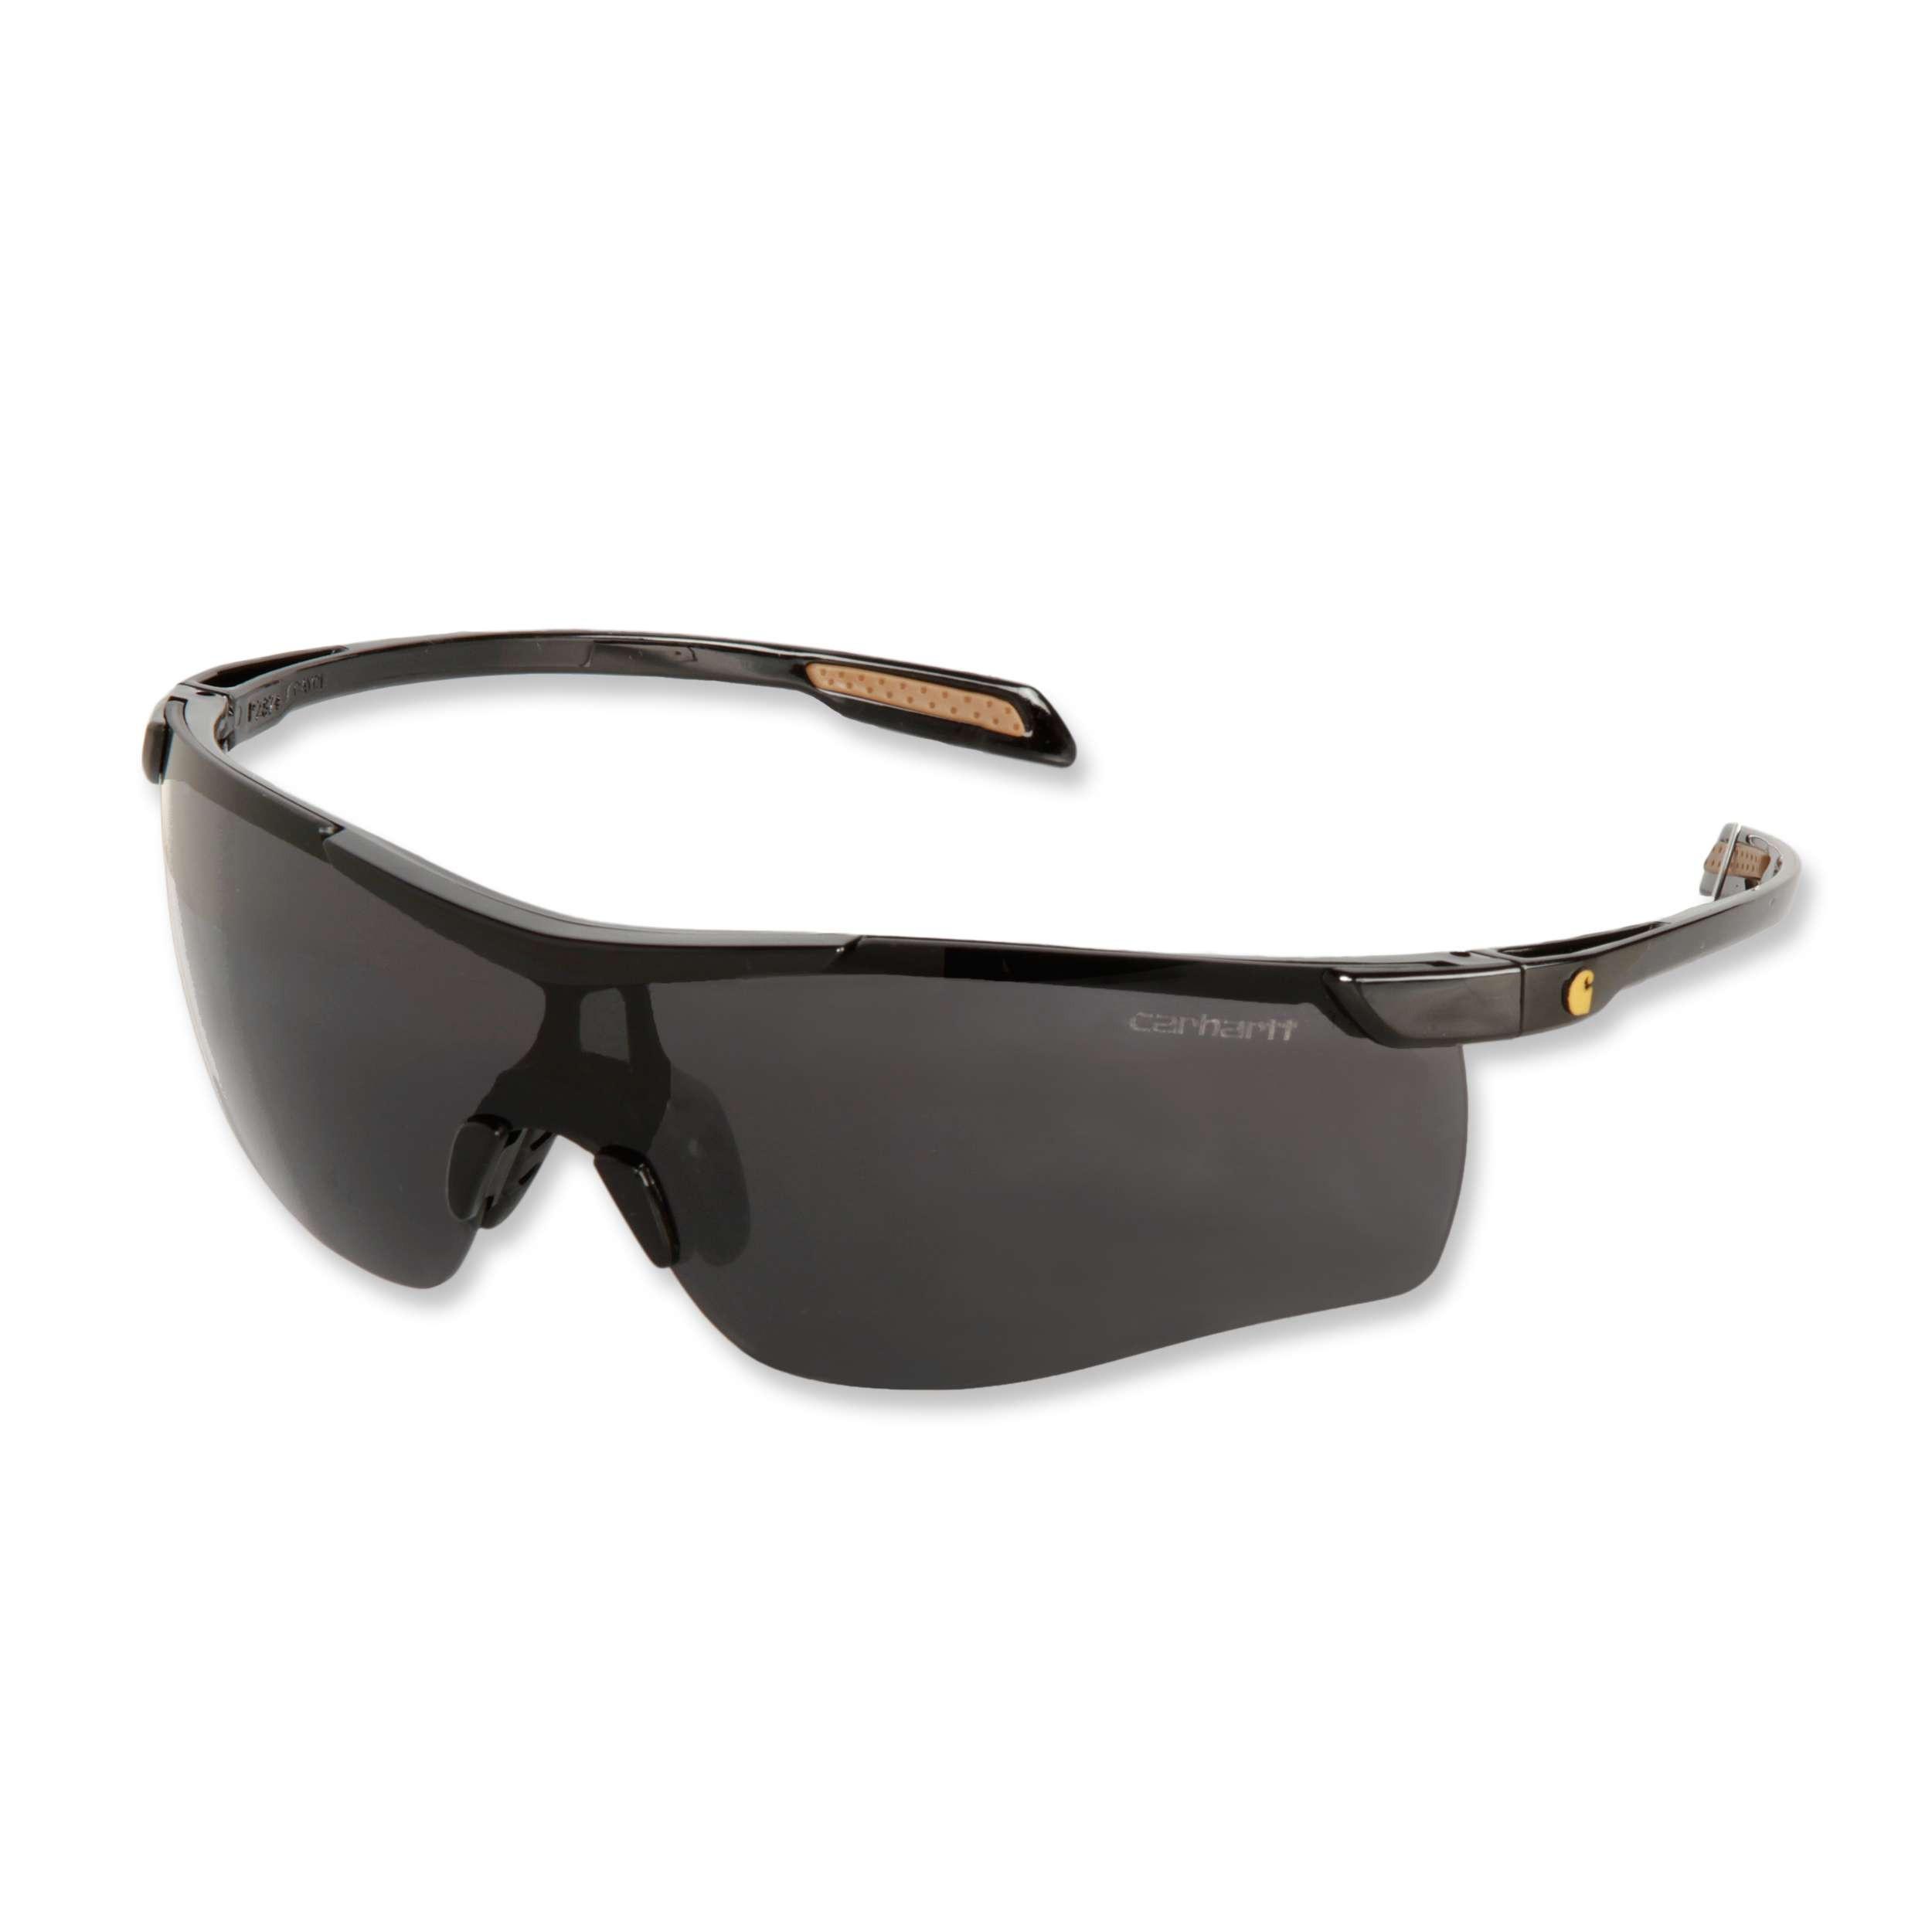 Очки защитные Carhartt Cayce Glasses - EGB9ST (Gray, OFA)